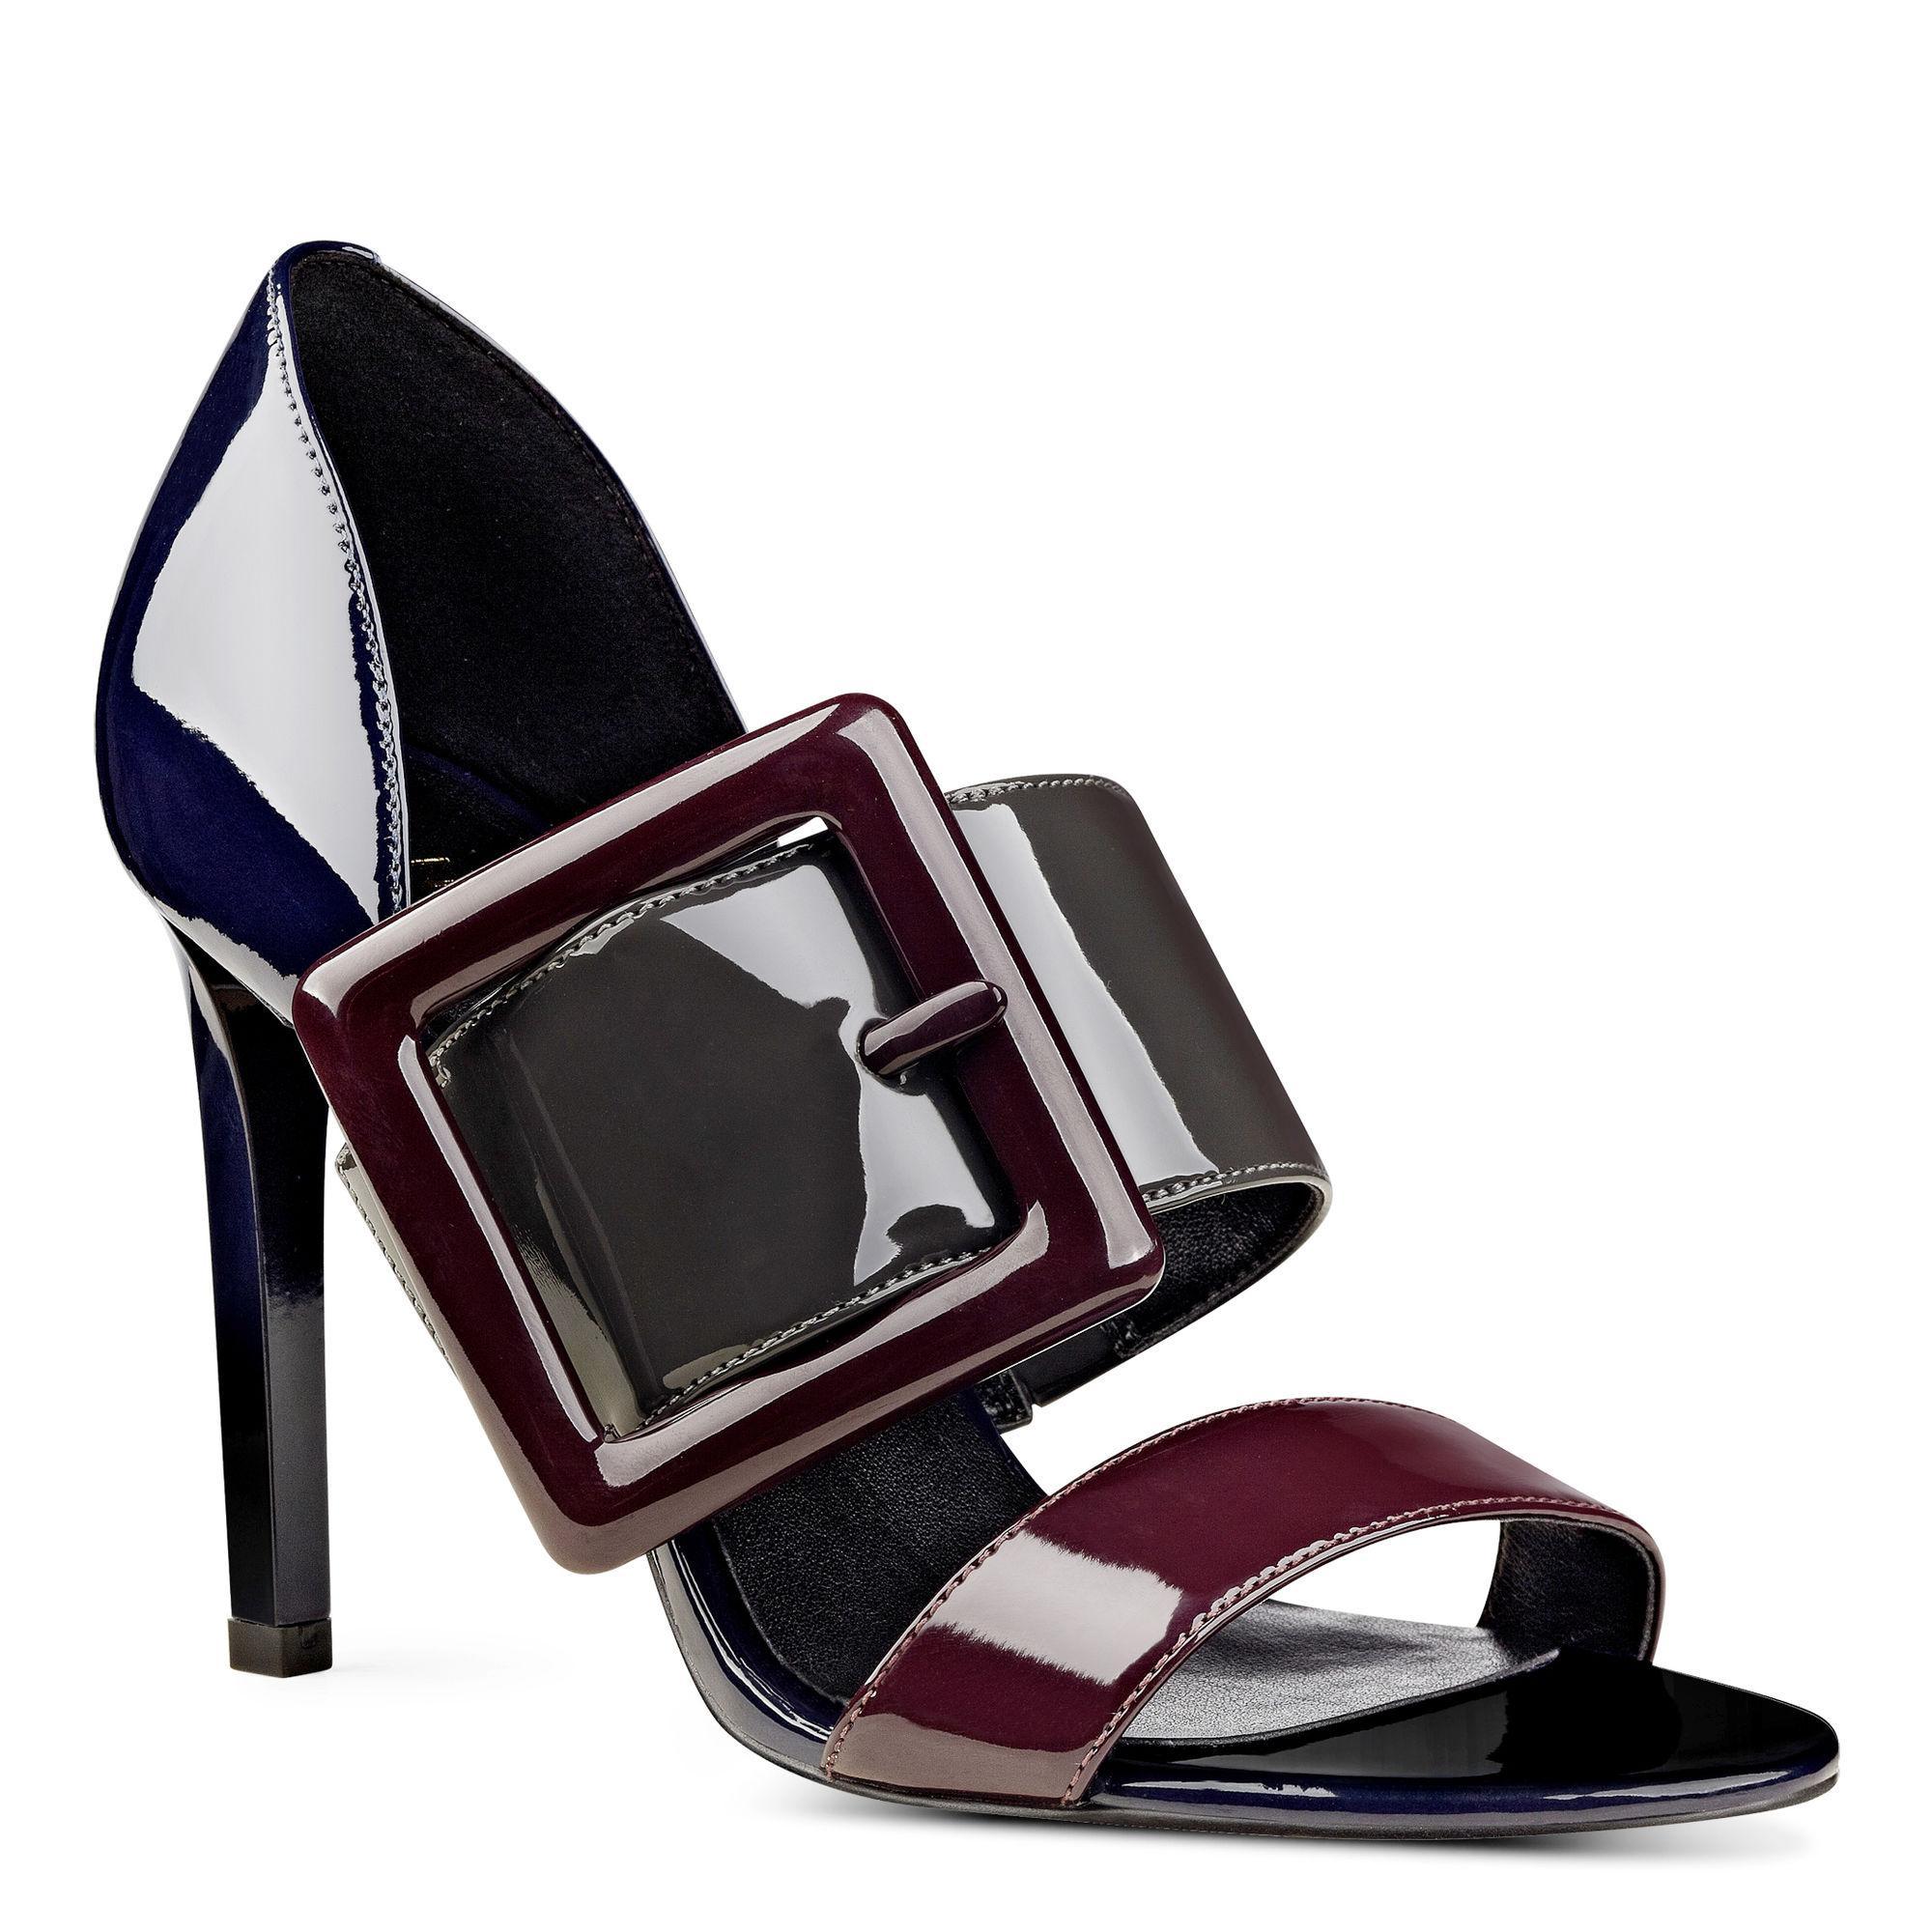 Nine West Womens Langley Open Toe Casual Slide Sandals MultiColor Size 65